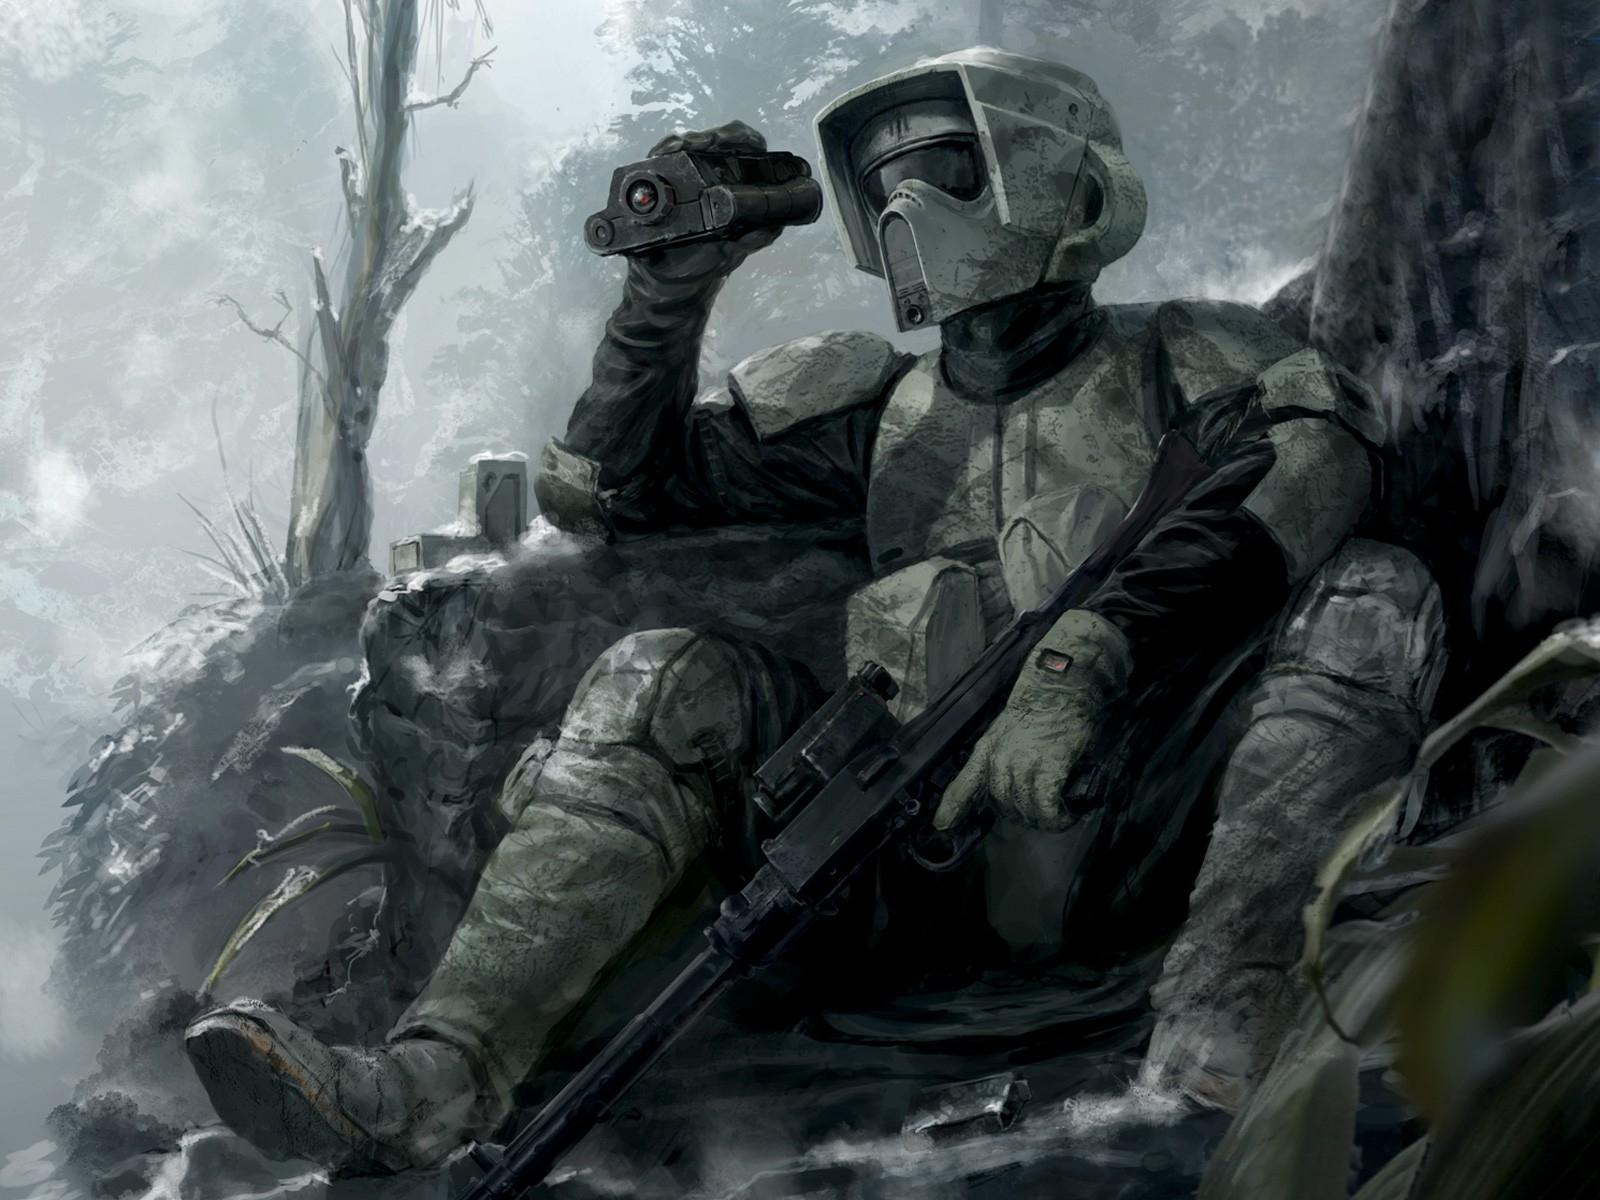 Cloaking_armor_SWTCG_by_Kai_Lim.jpg